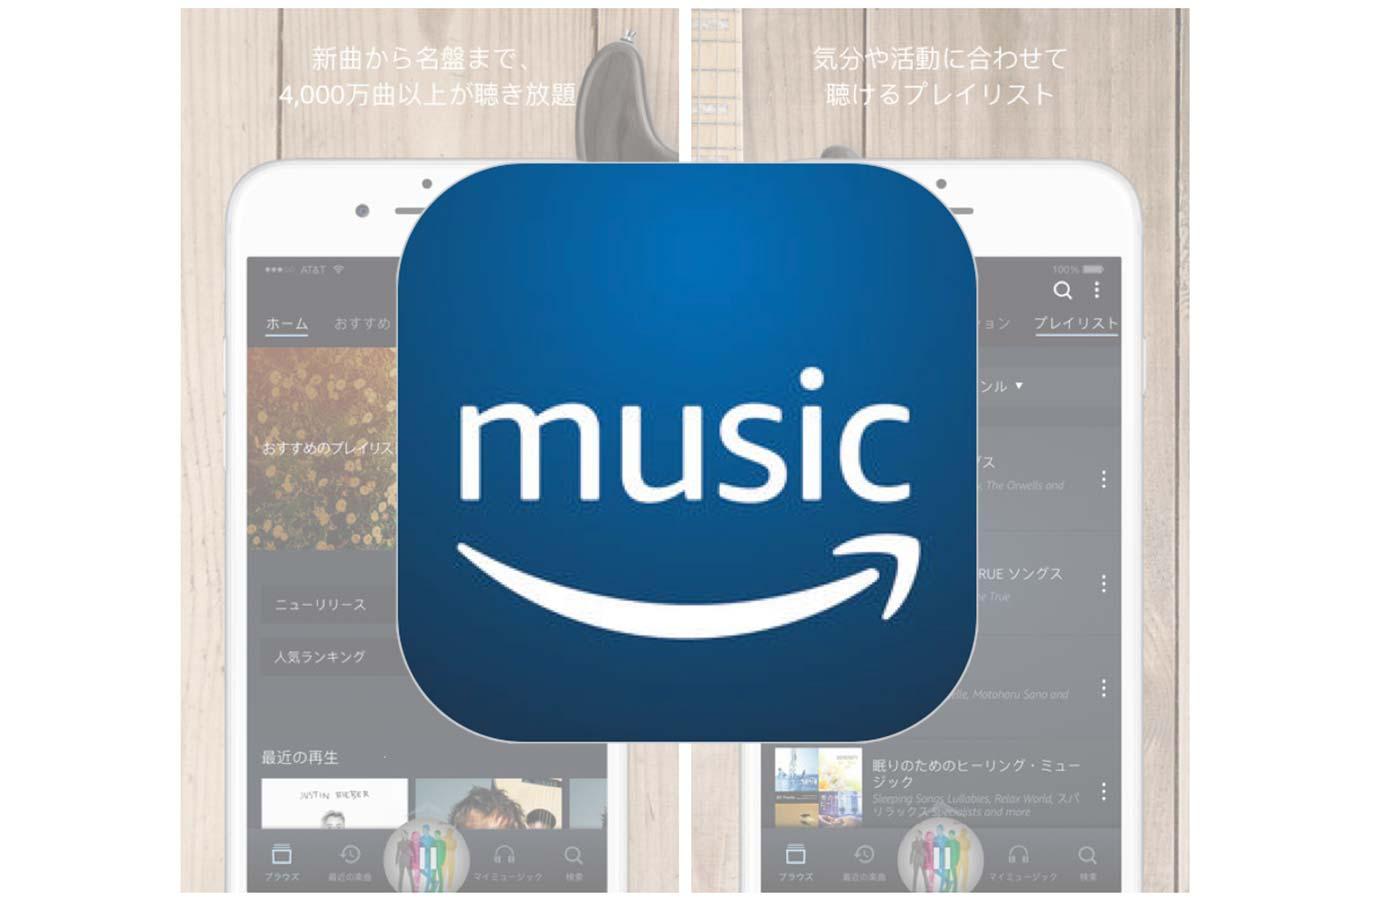 Amazon、 定額制音楽サービス「Amazon Music Unlimited」の提供開始 ― iOSアプリ「Amazon Music 7.1.0」から対応